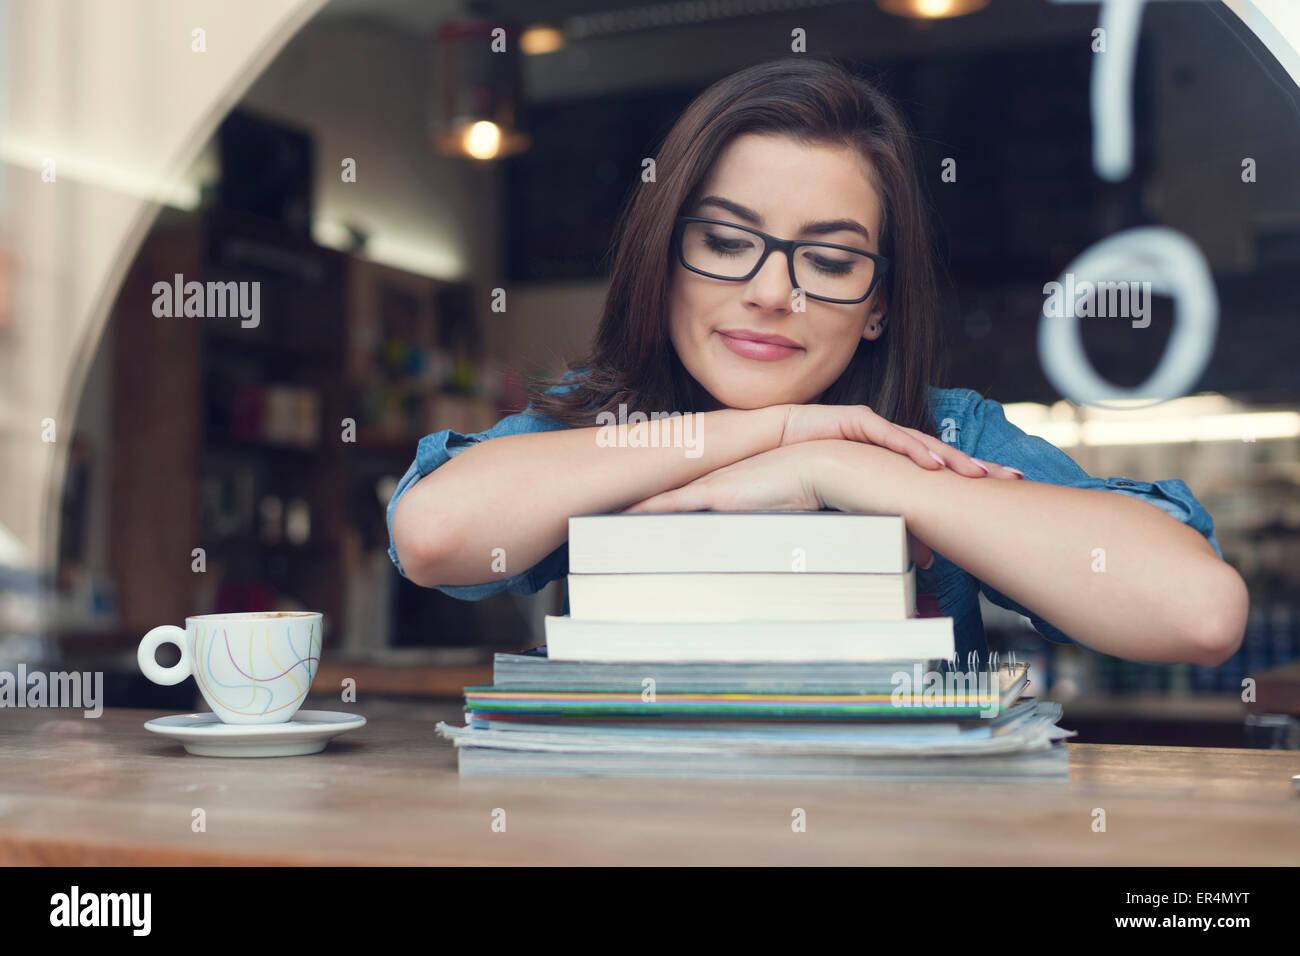 Schöne und lächelnd Studentin im Café. Krakau, Polen Stockbild